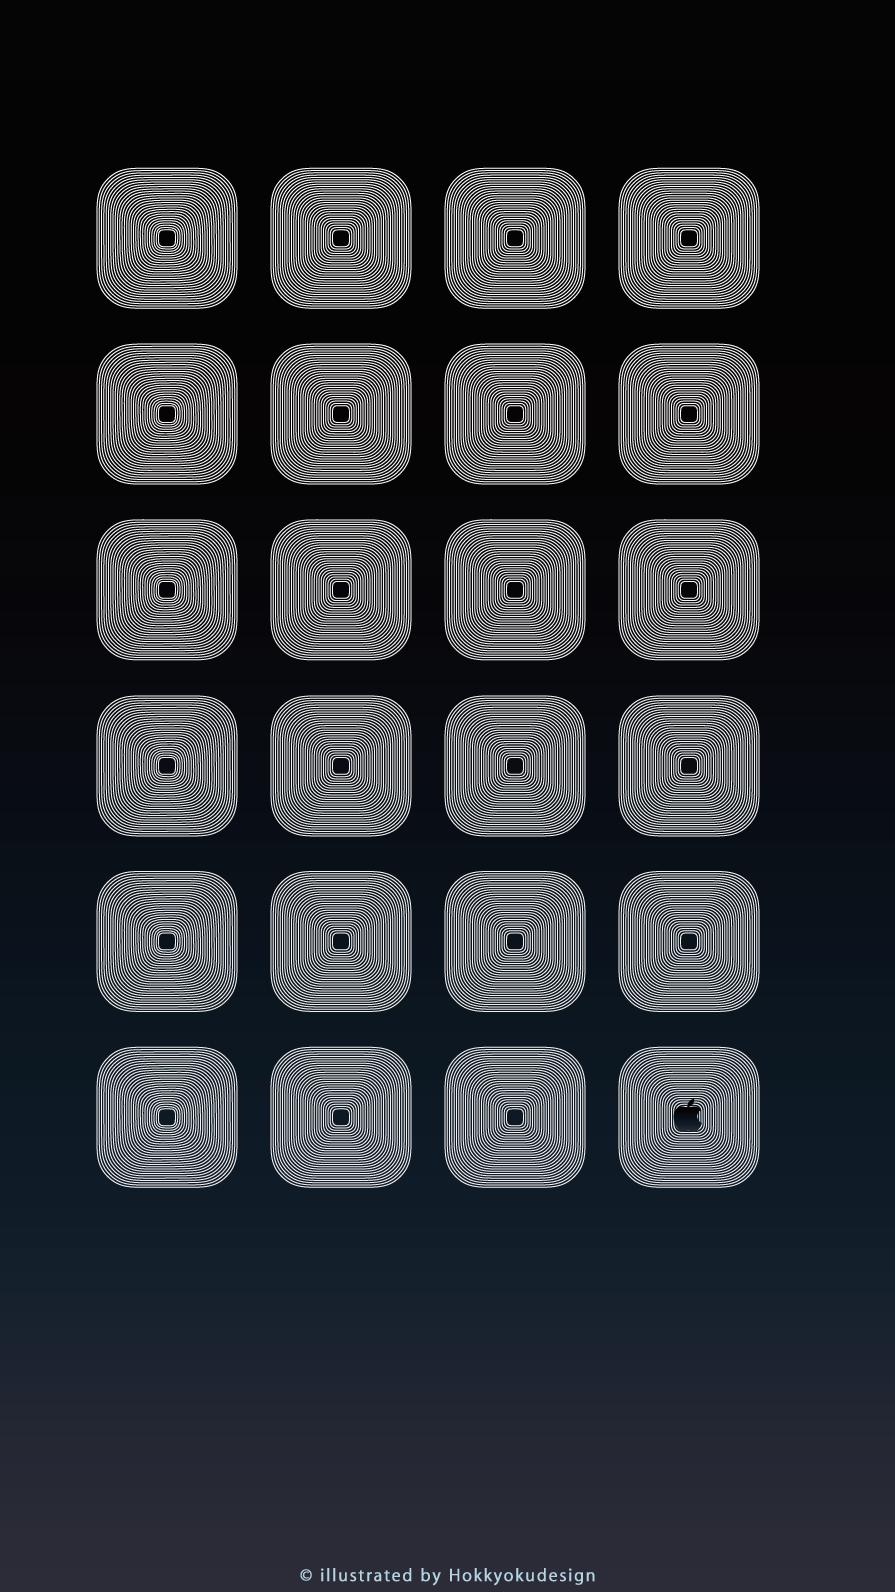 Iphone8 7 6s 6用 動く棚の壁紙 ブルーブラック ホワイト Wallpaper To Iphone6 Shelf Type Moving Wallpaper